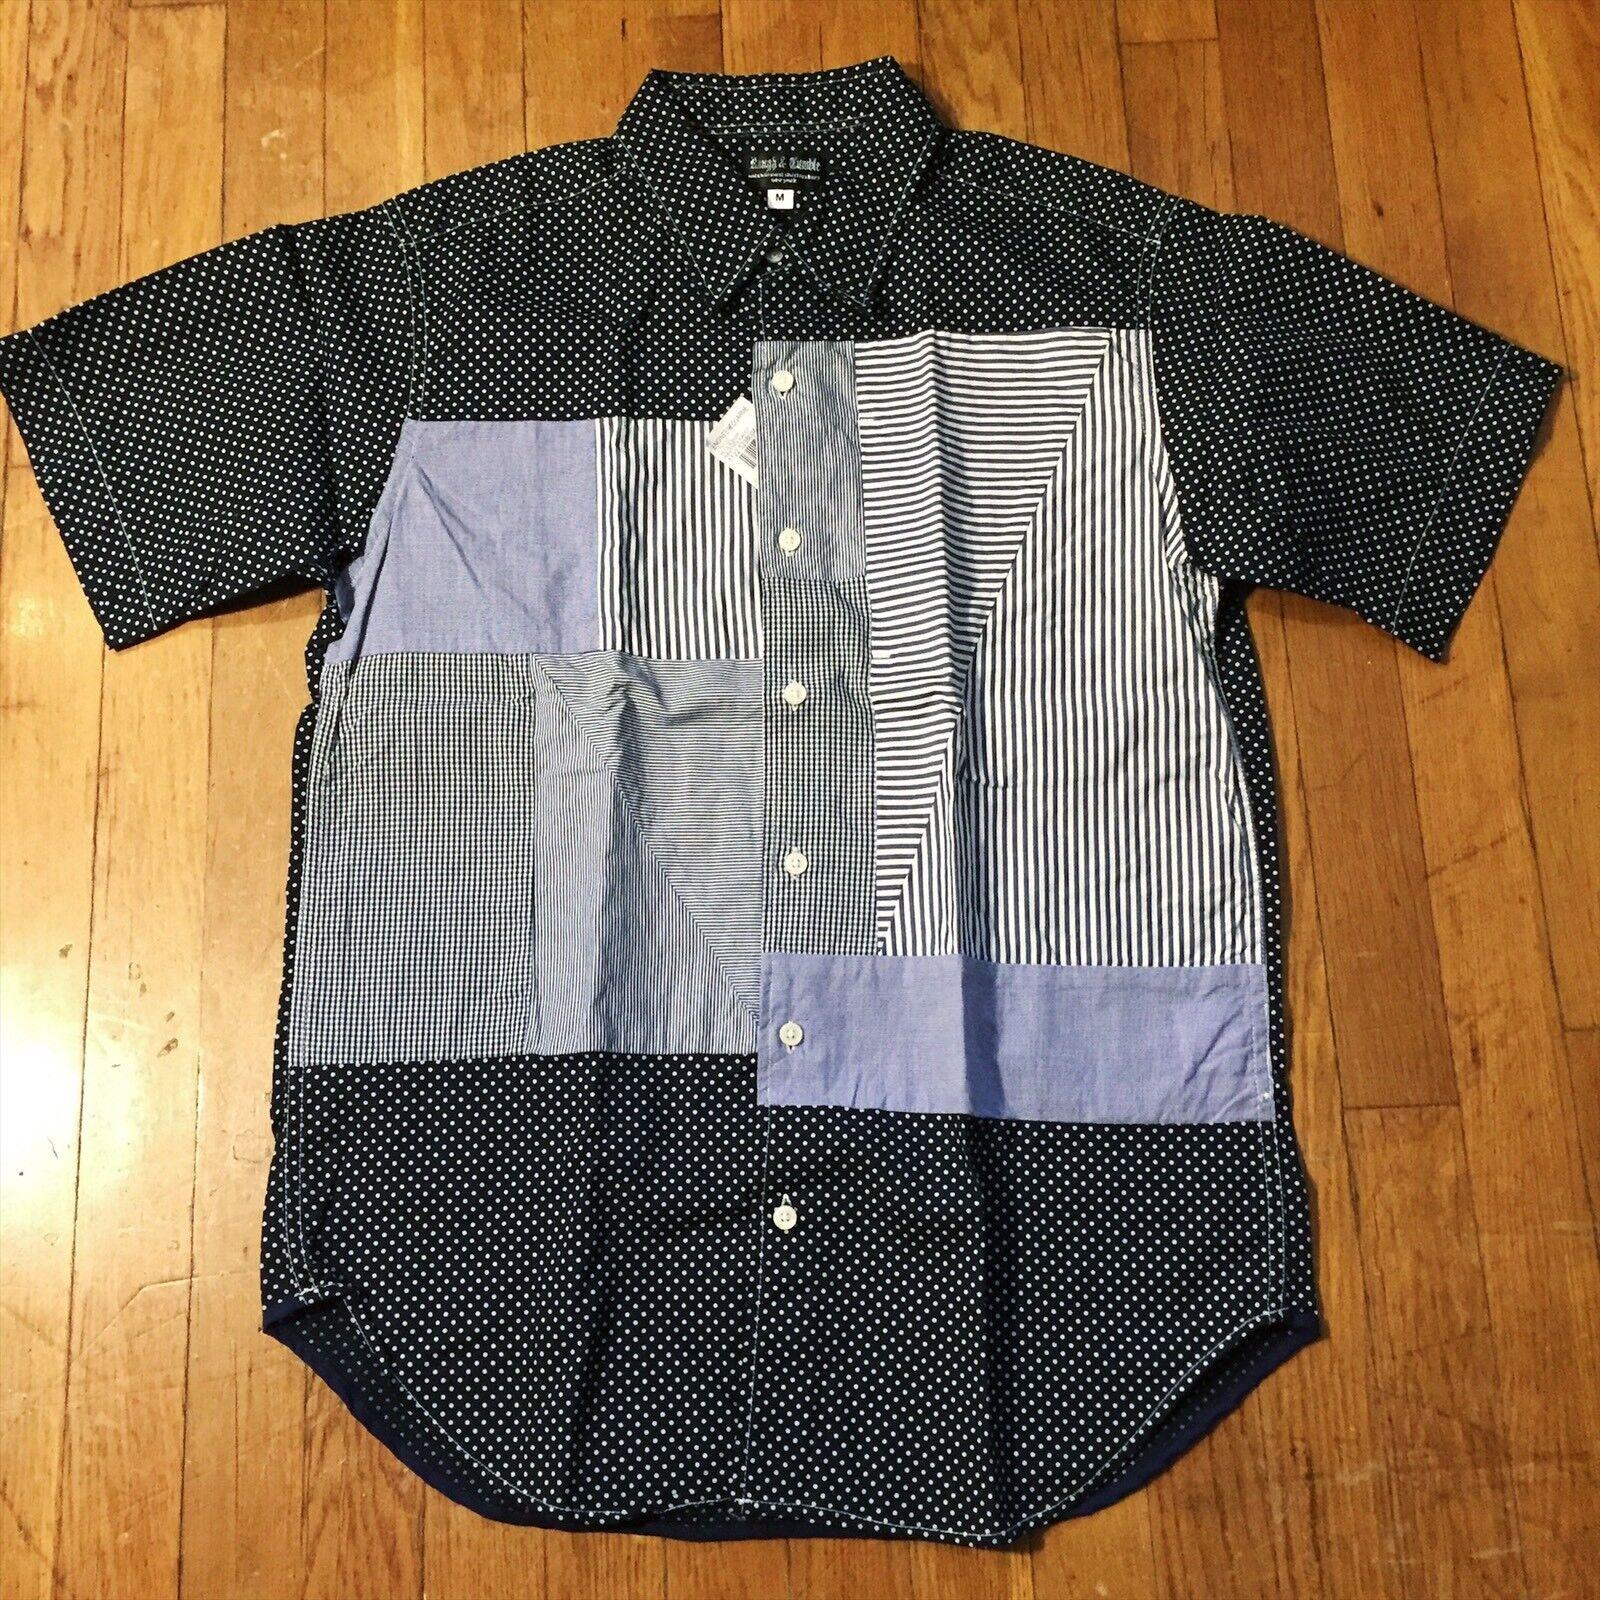 Rough & Tumble von Nepenthes Marineblue Patchwork Hemd Engineered Garments Cdg